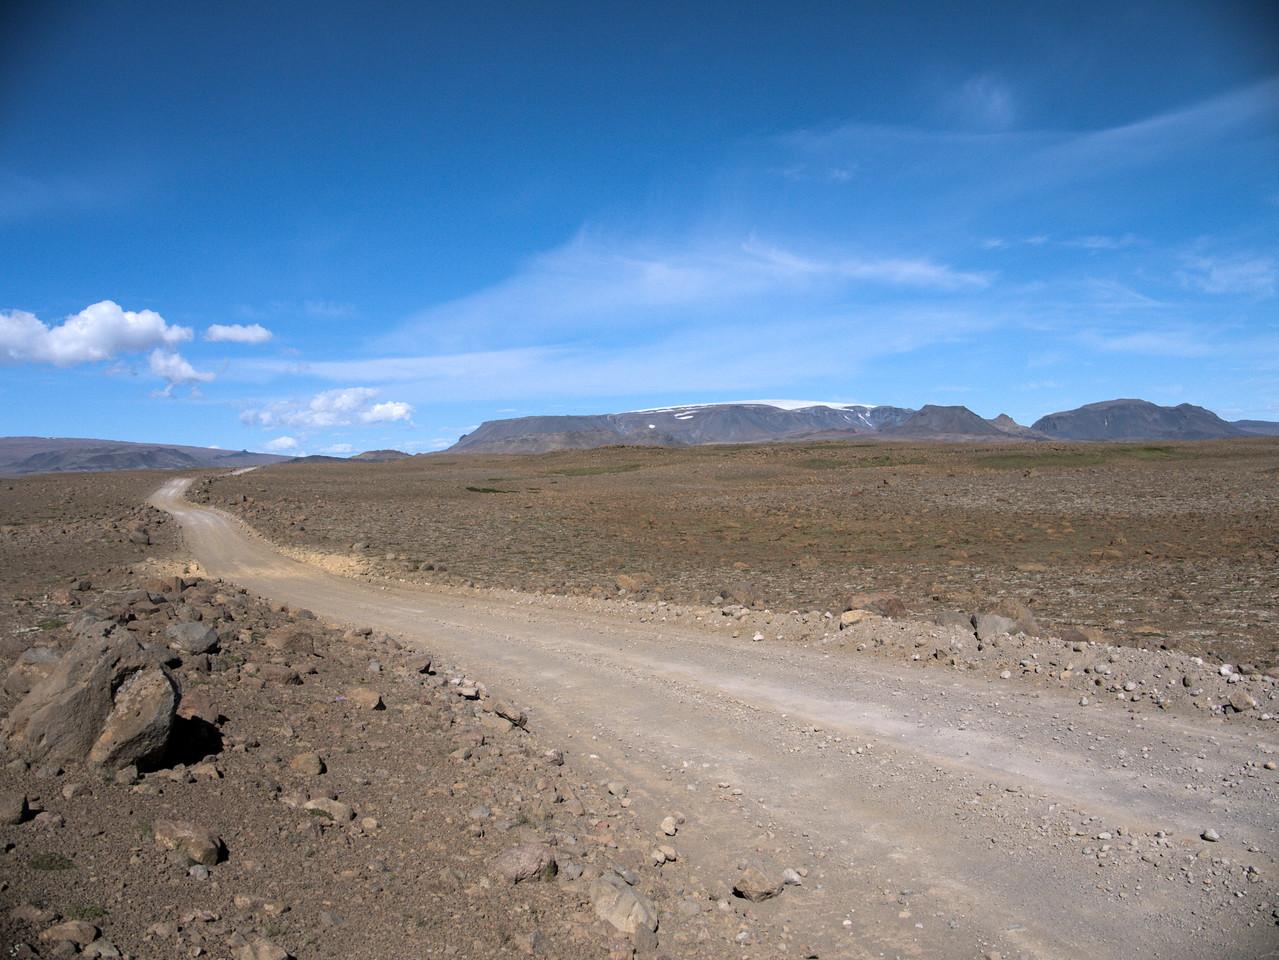 Pinvallenvatn to Borgornes HIgh Desert